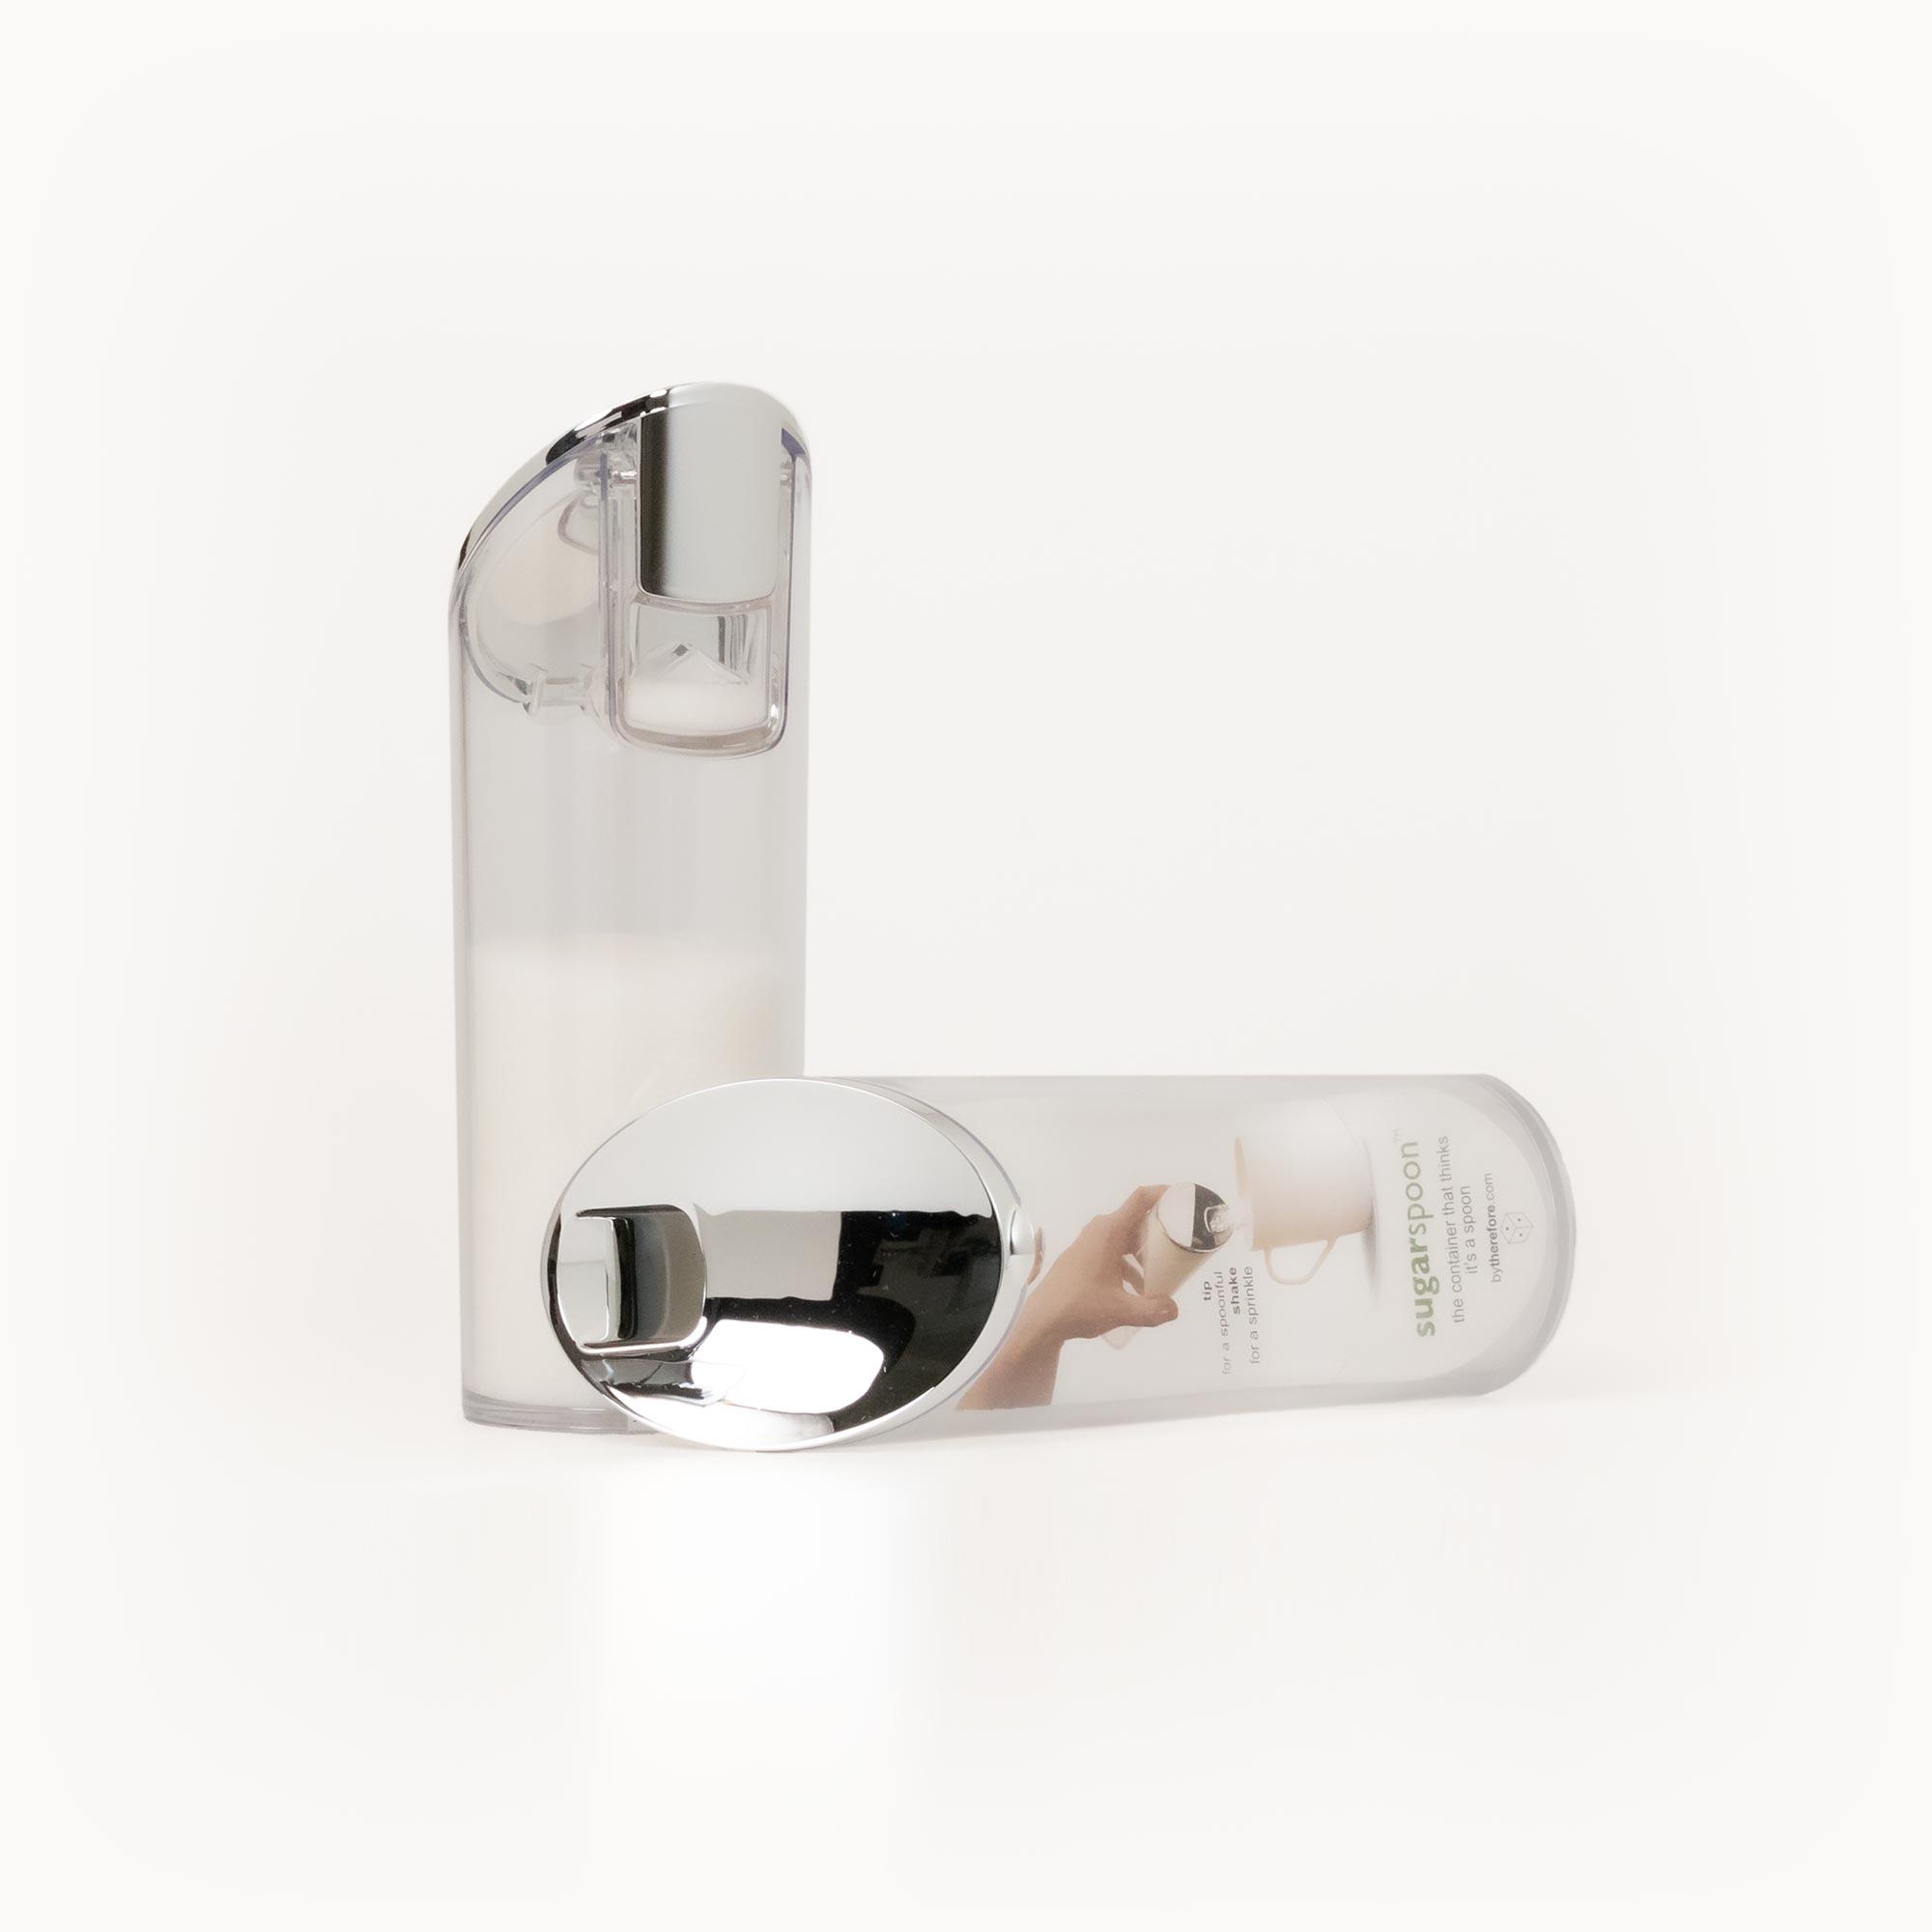 SugarSpoon Dispenser